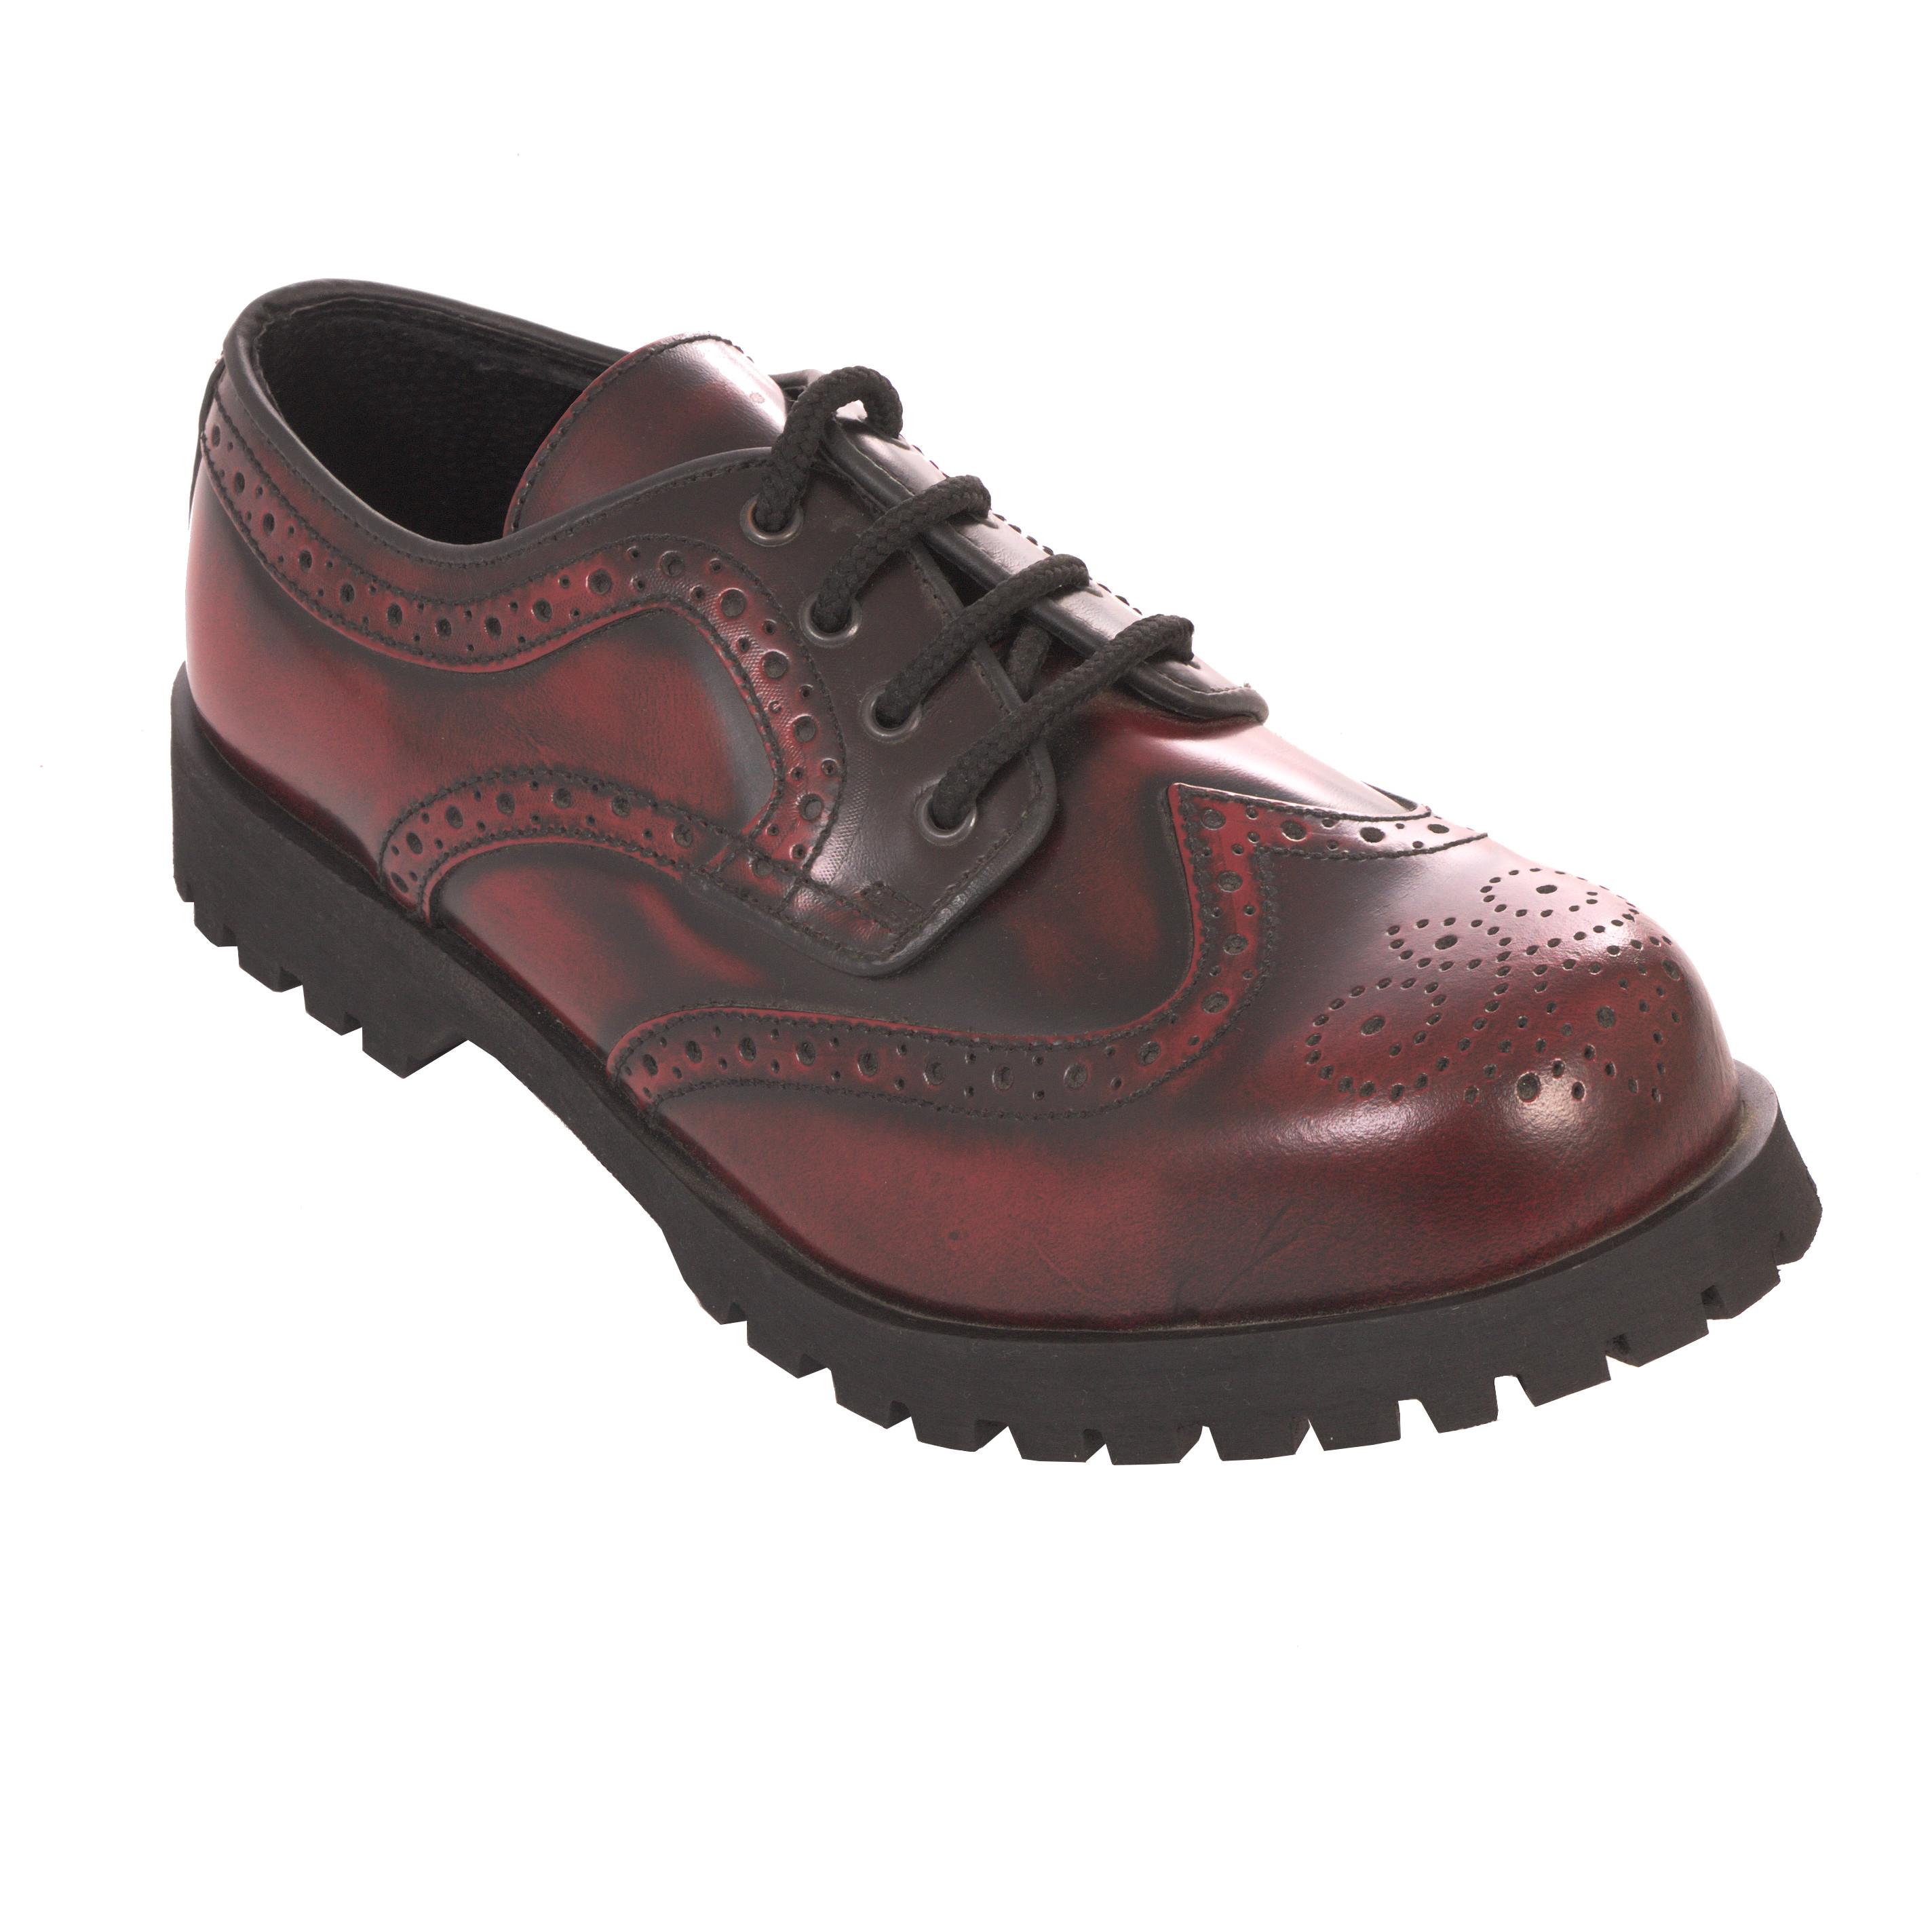 Boots /& Braces Halbschuh Budapester Rub Off-Stahlkappe-Herrenhalbschuh-Vintage